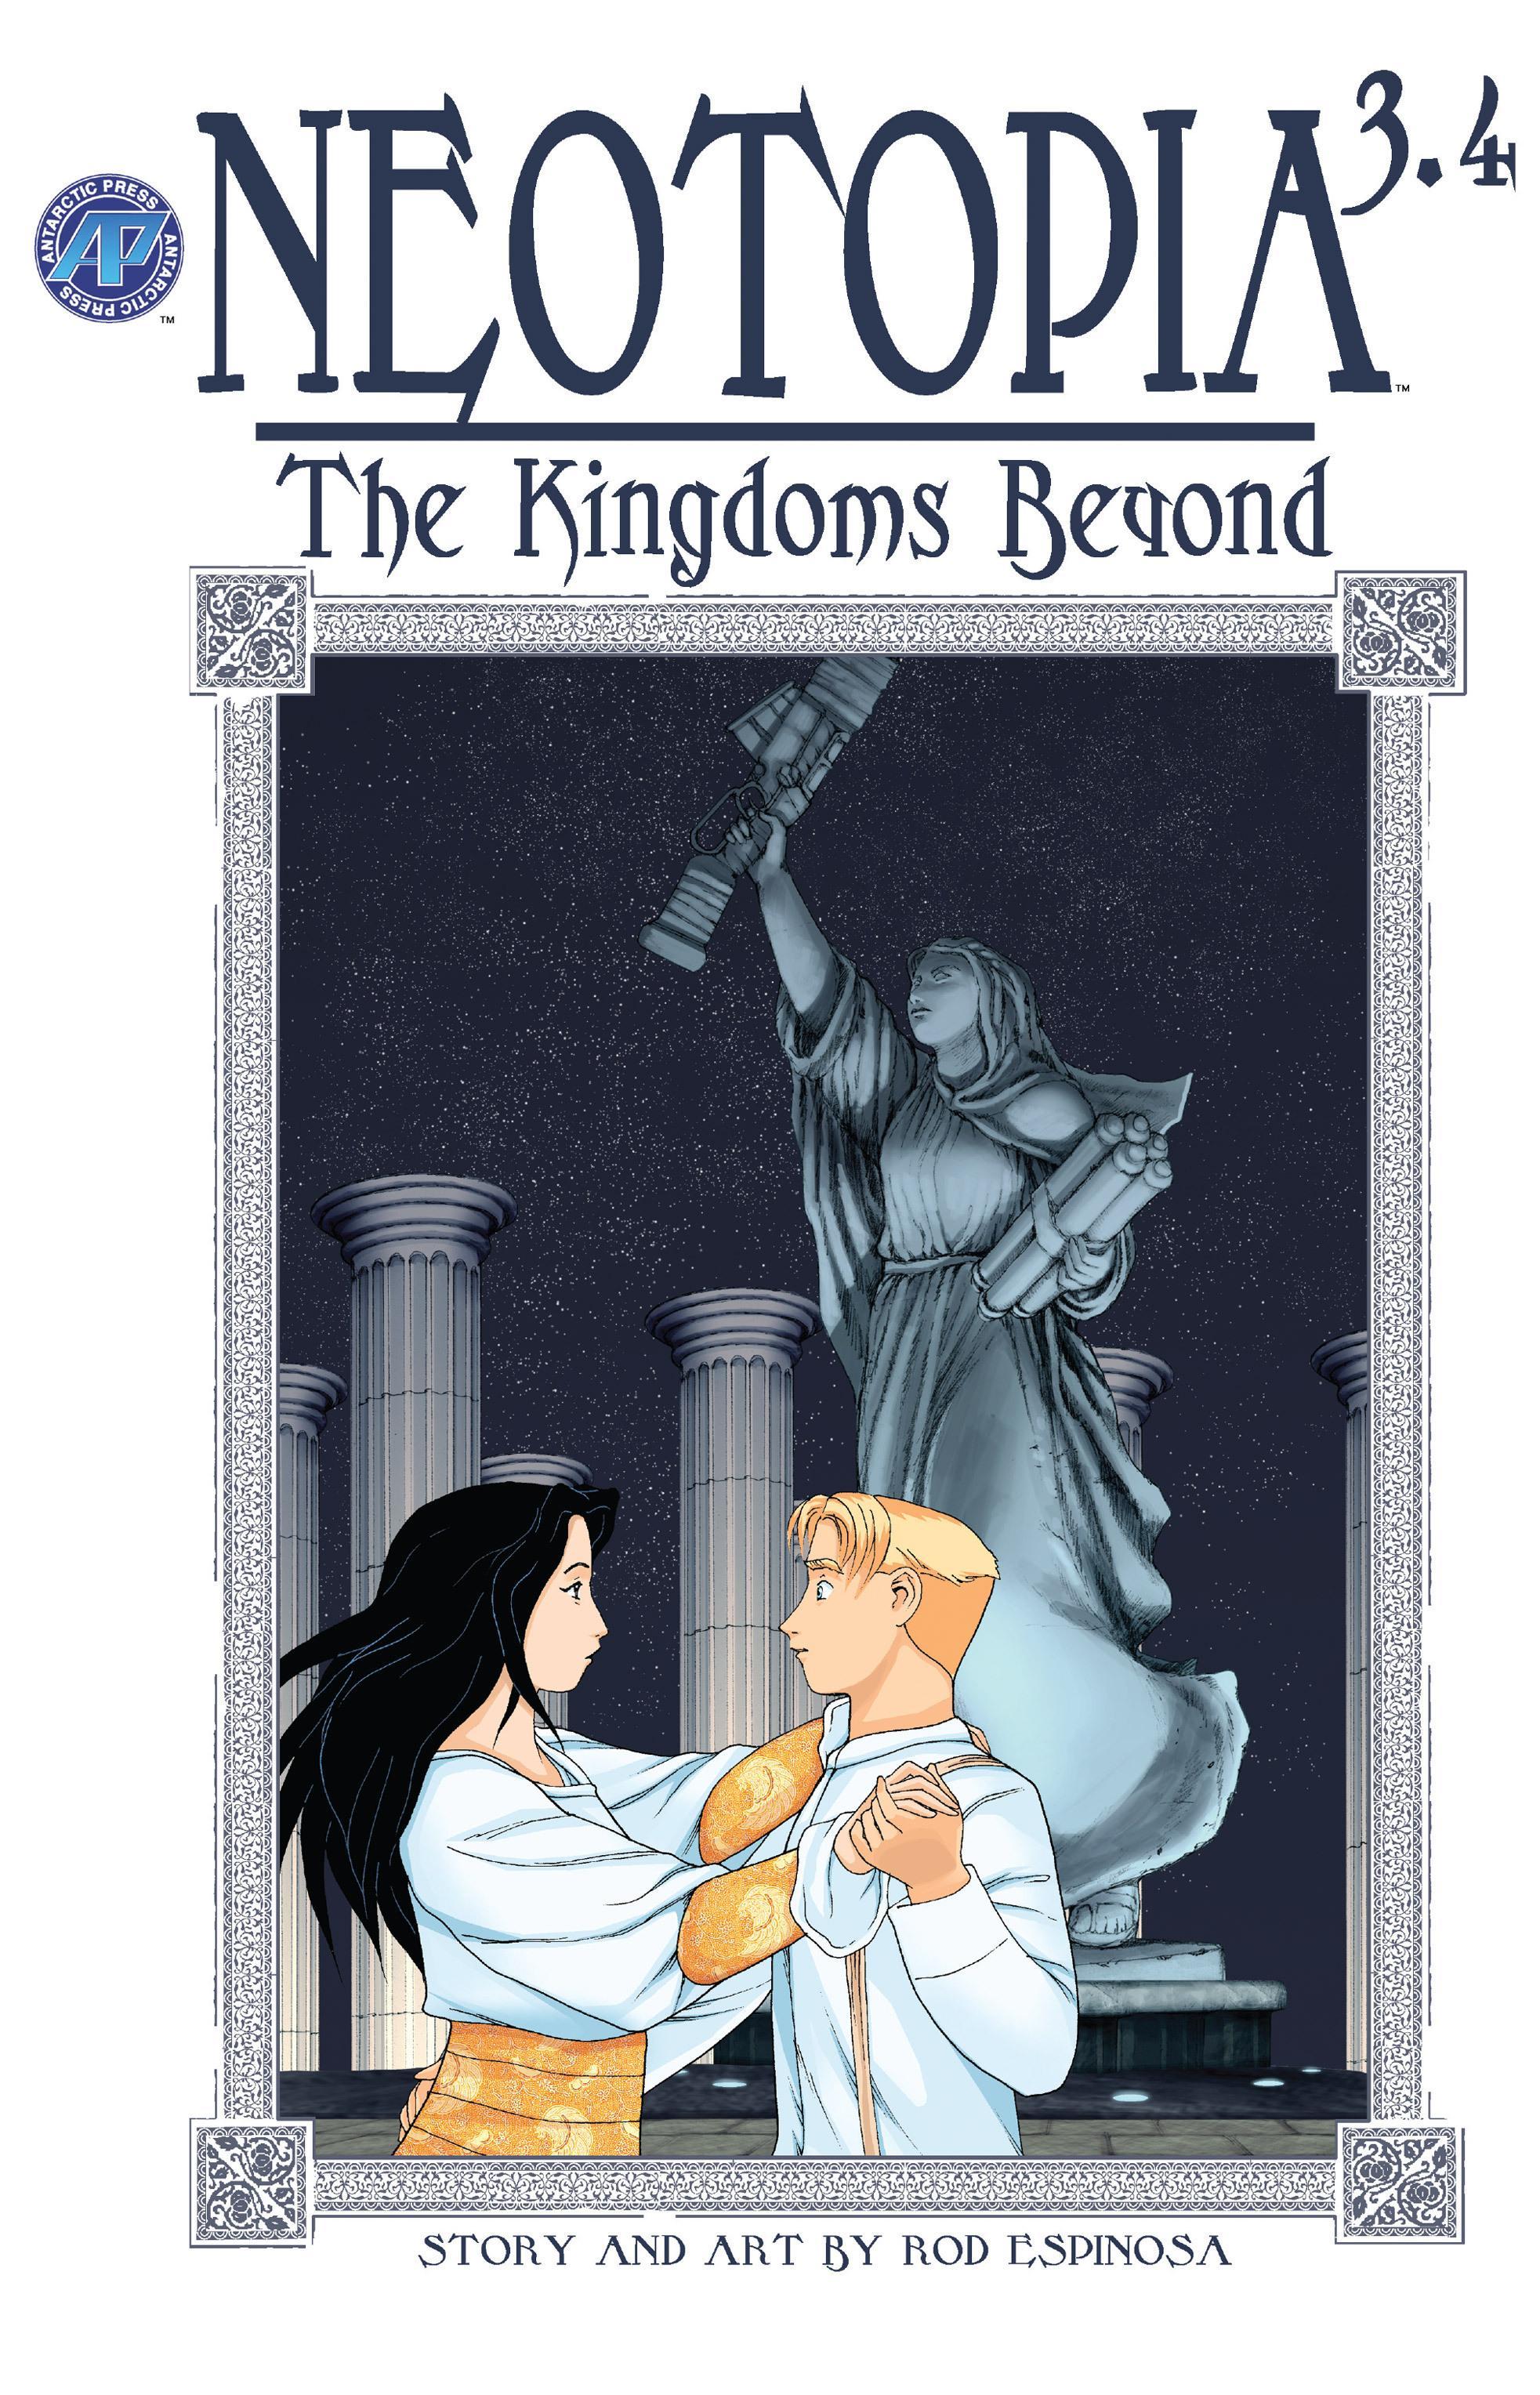 Neotopia v3 The Kingdoms Beyond 001 005 (2004) Neotopia Vol 03 The Kingdoms Beyond 04 (of 05) (2004) (digital) (Minutemen Anni